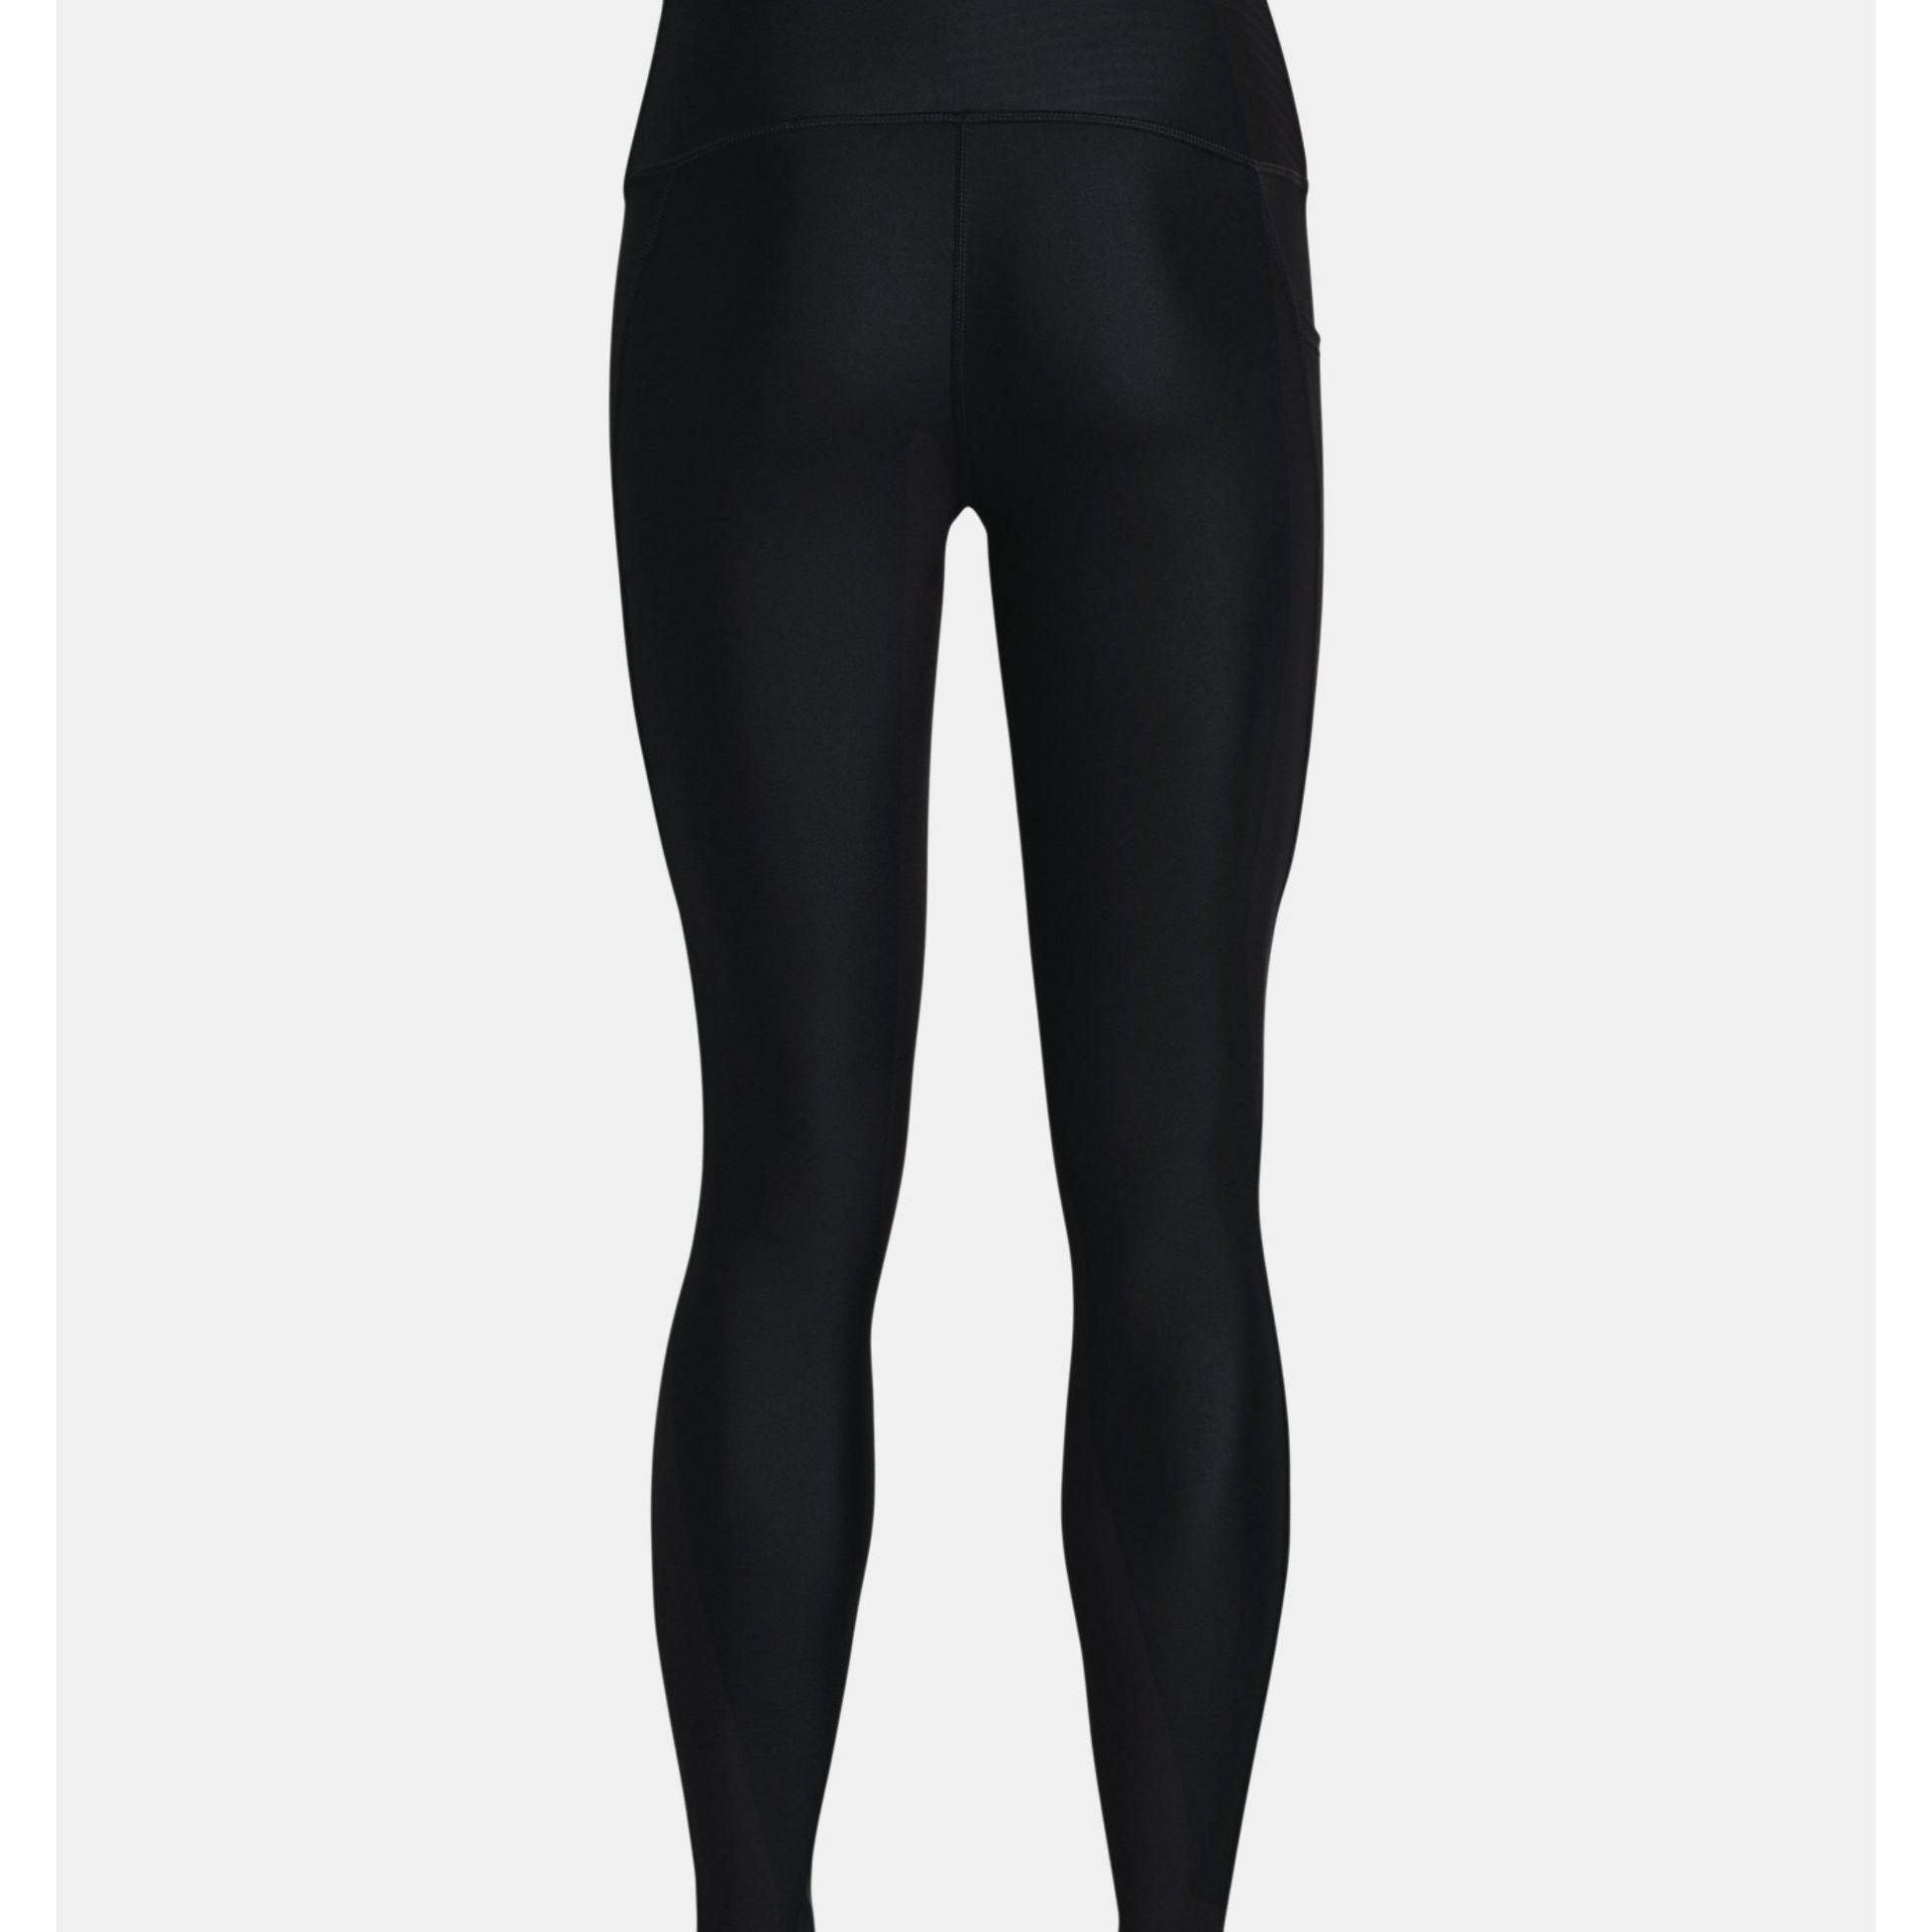 Îmbrăcăminte -  under armour HeatGear Armour No-Slip Waistband Shine Full-Length Leggings